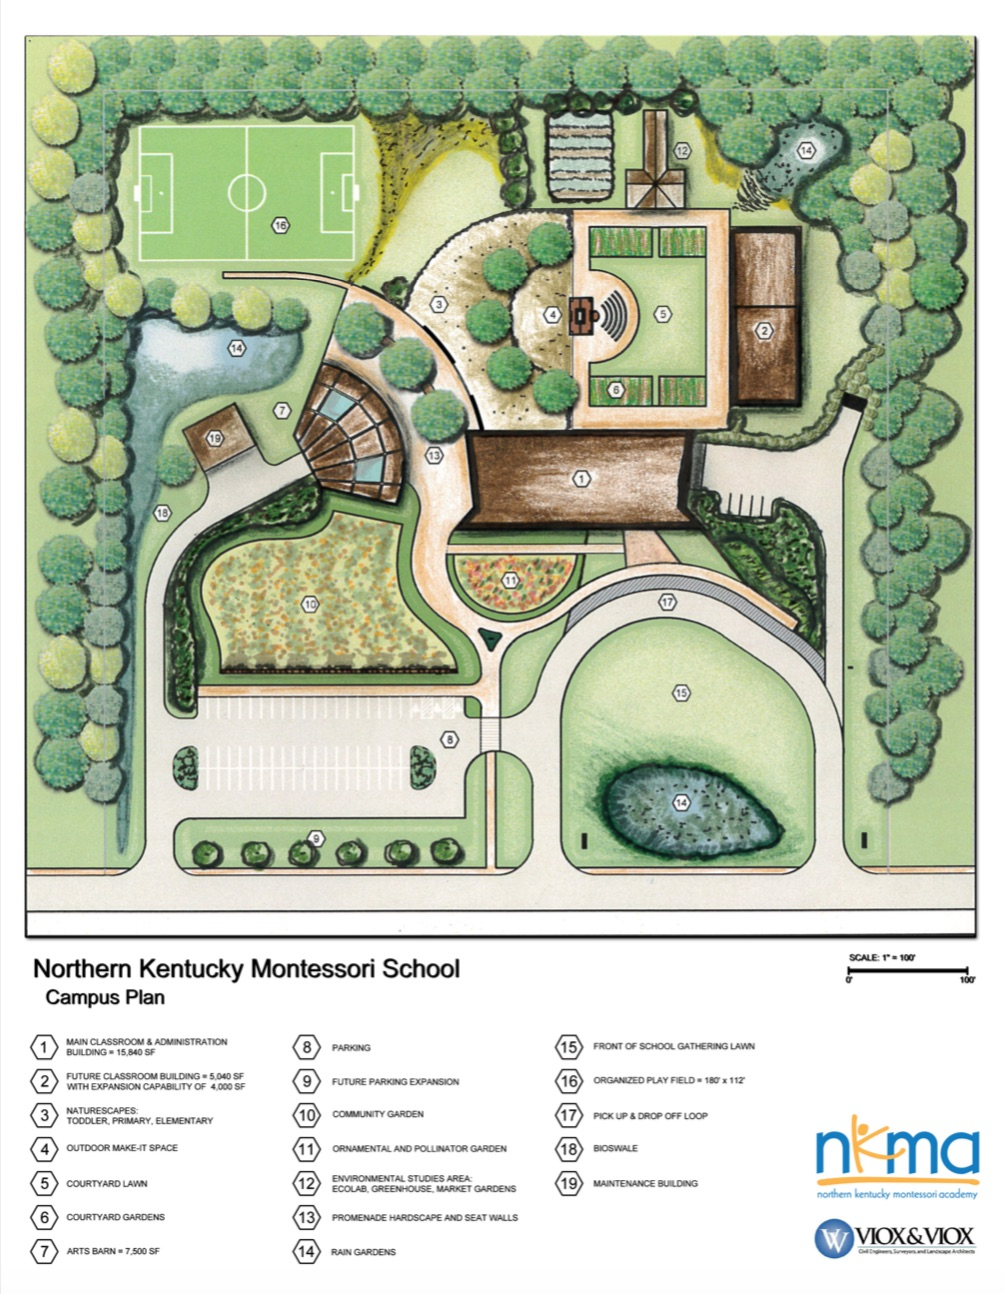 - NKMA Concept Campus Master Plan